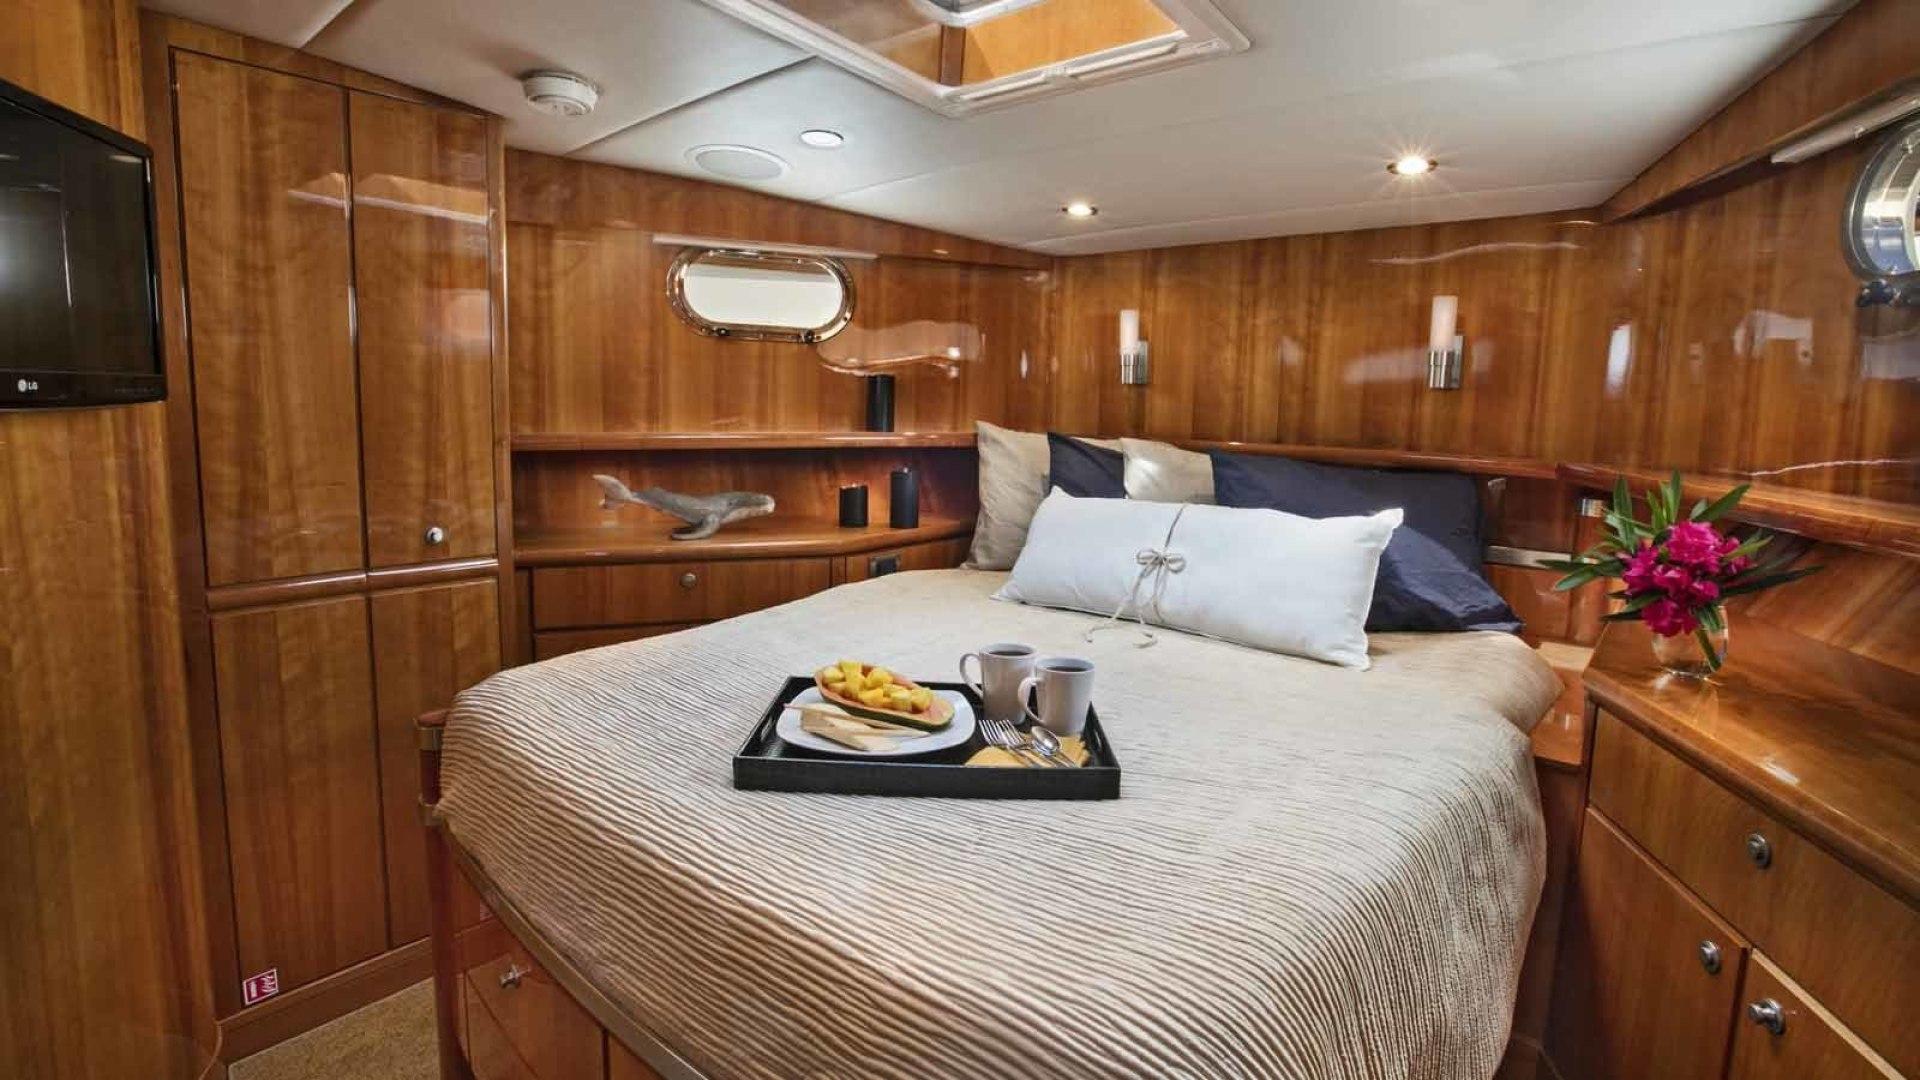 Queenship-Barretta 76 2004-SEA MYSTIC Fort Myers-Florida-United States-VIP Stateroom-1588109 | Thumbnail